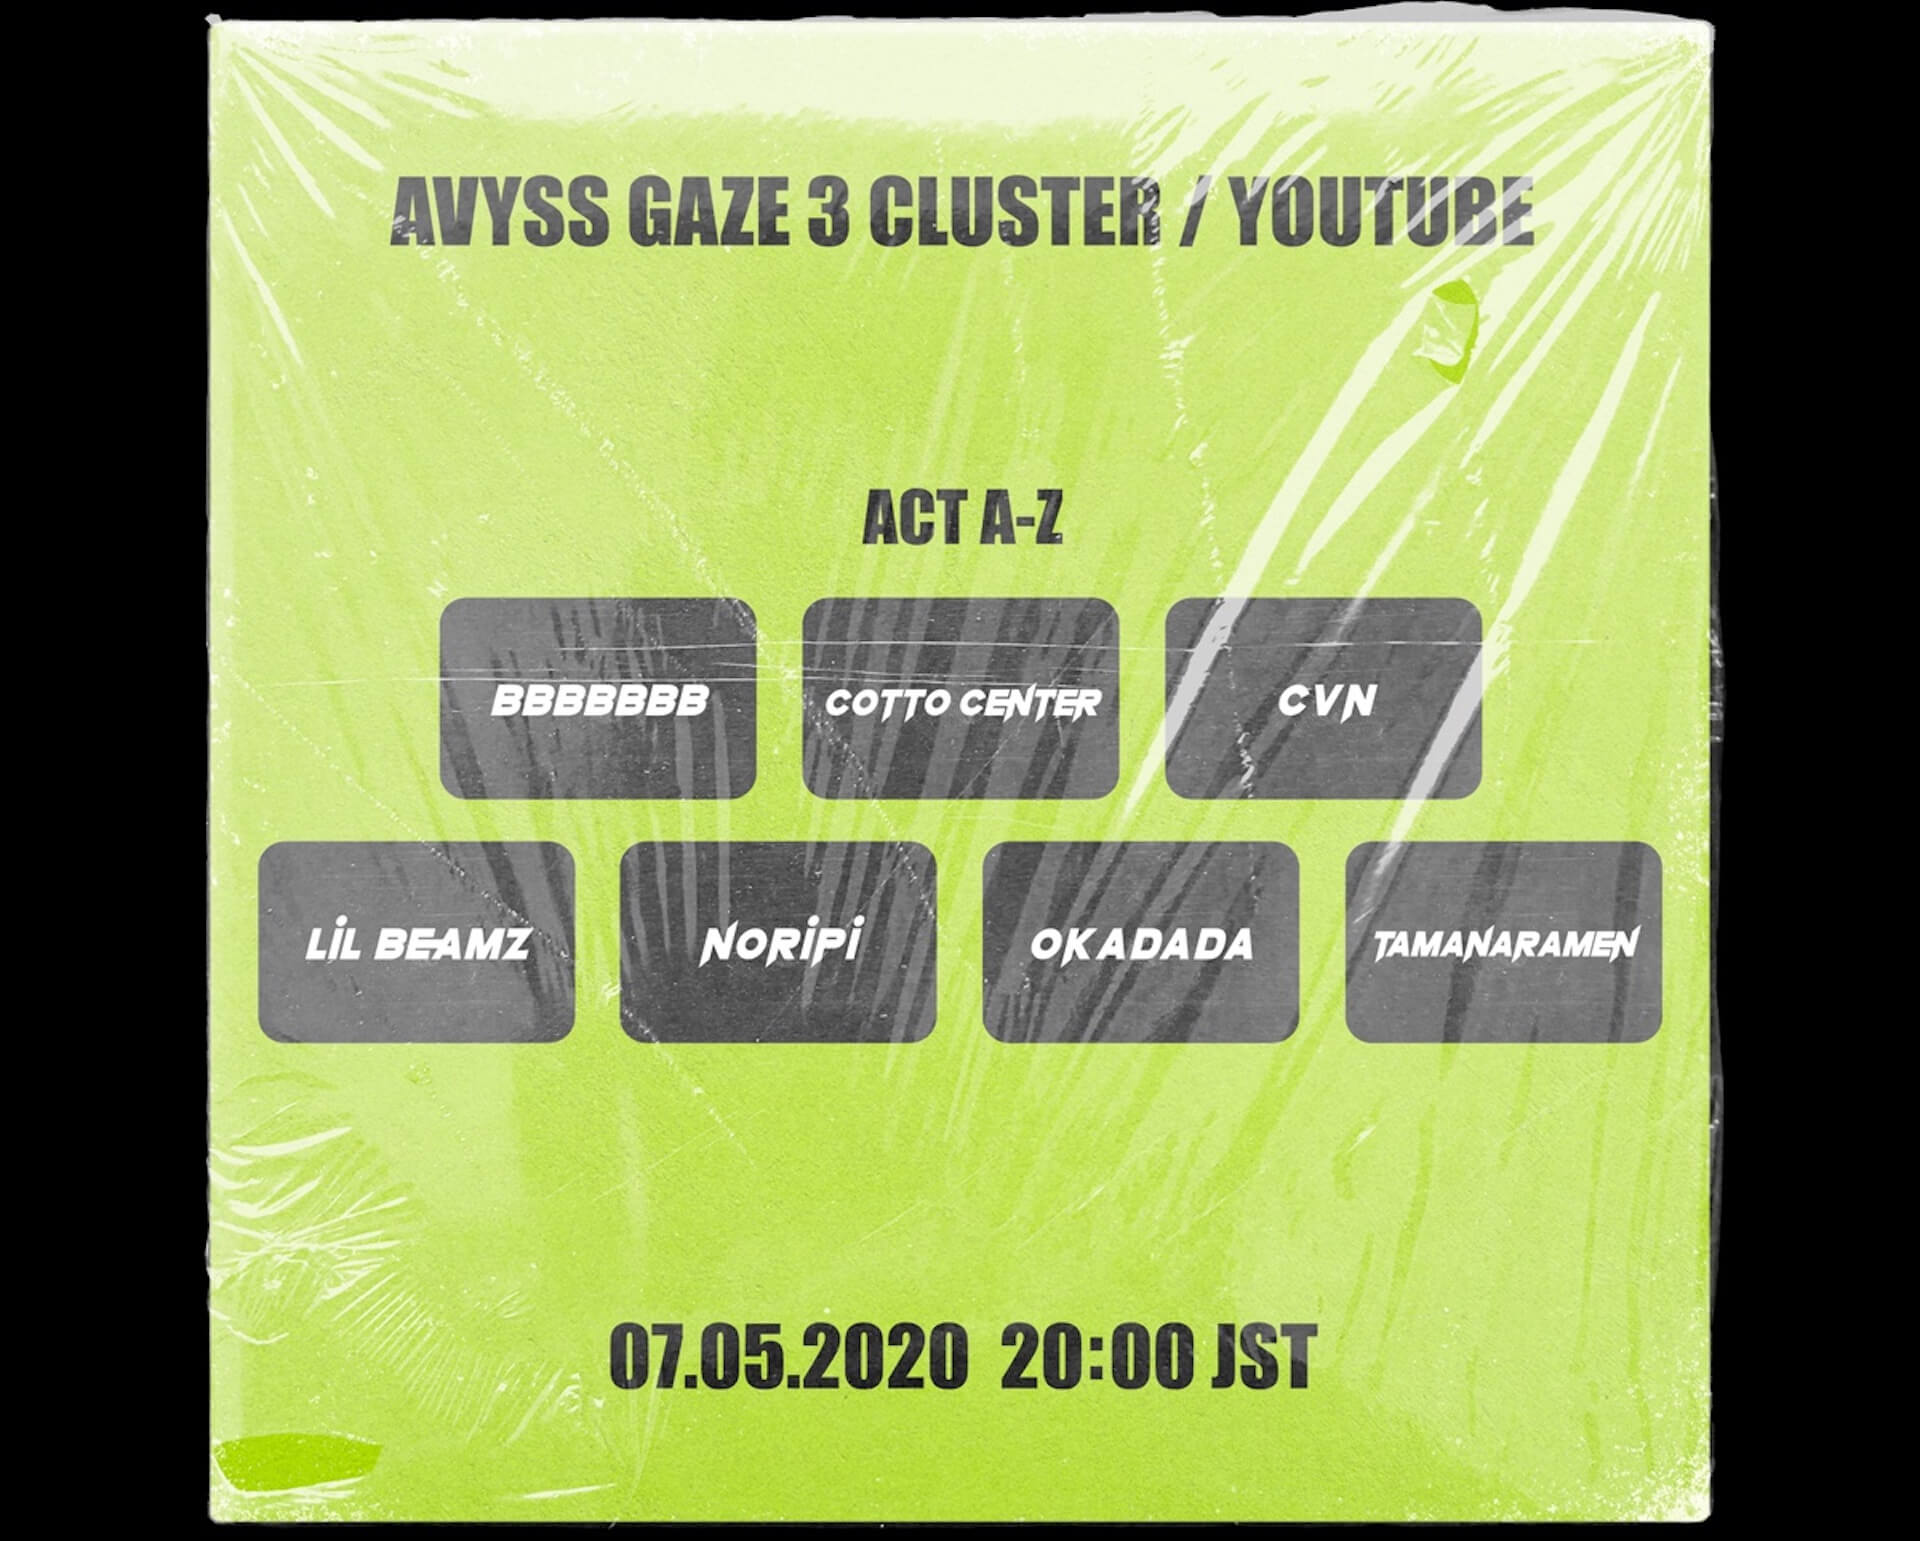 <AVYSS GAZE>第3弾の仮想ナイトクラブがYouTubeチャンネルにて公開!NTsKiほか新ドネーションアイテムも受注開始 music200630_avyssgaze3_09